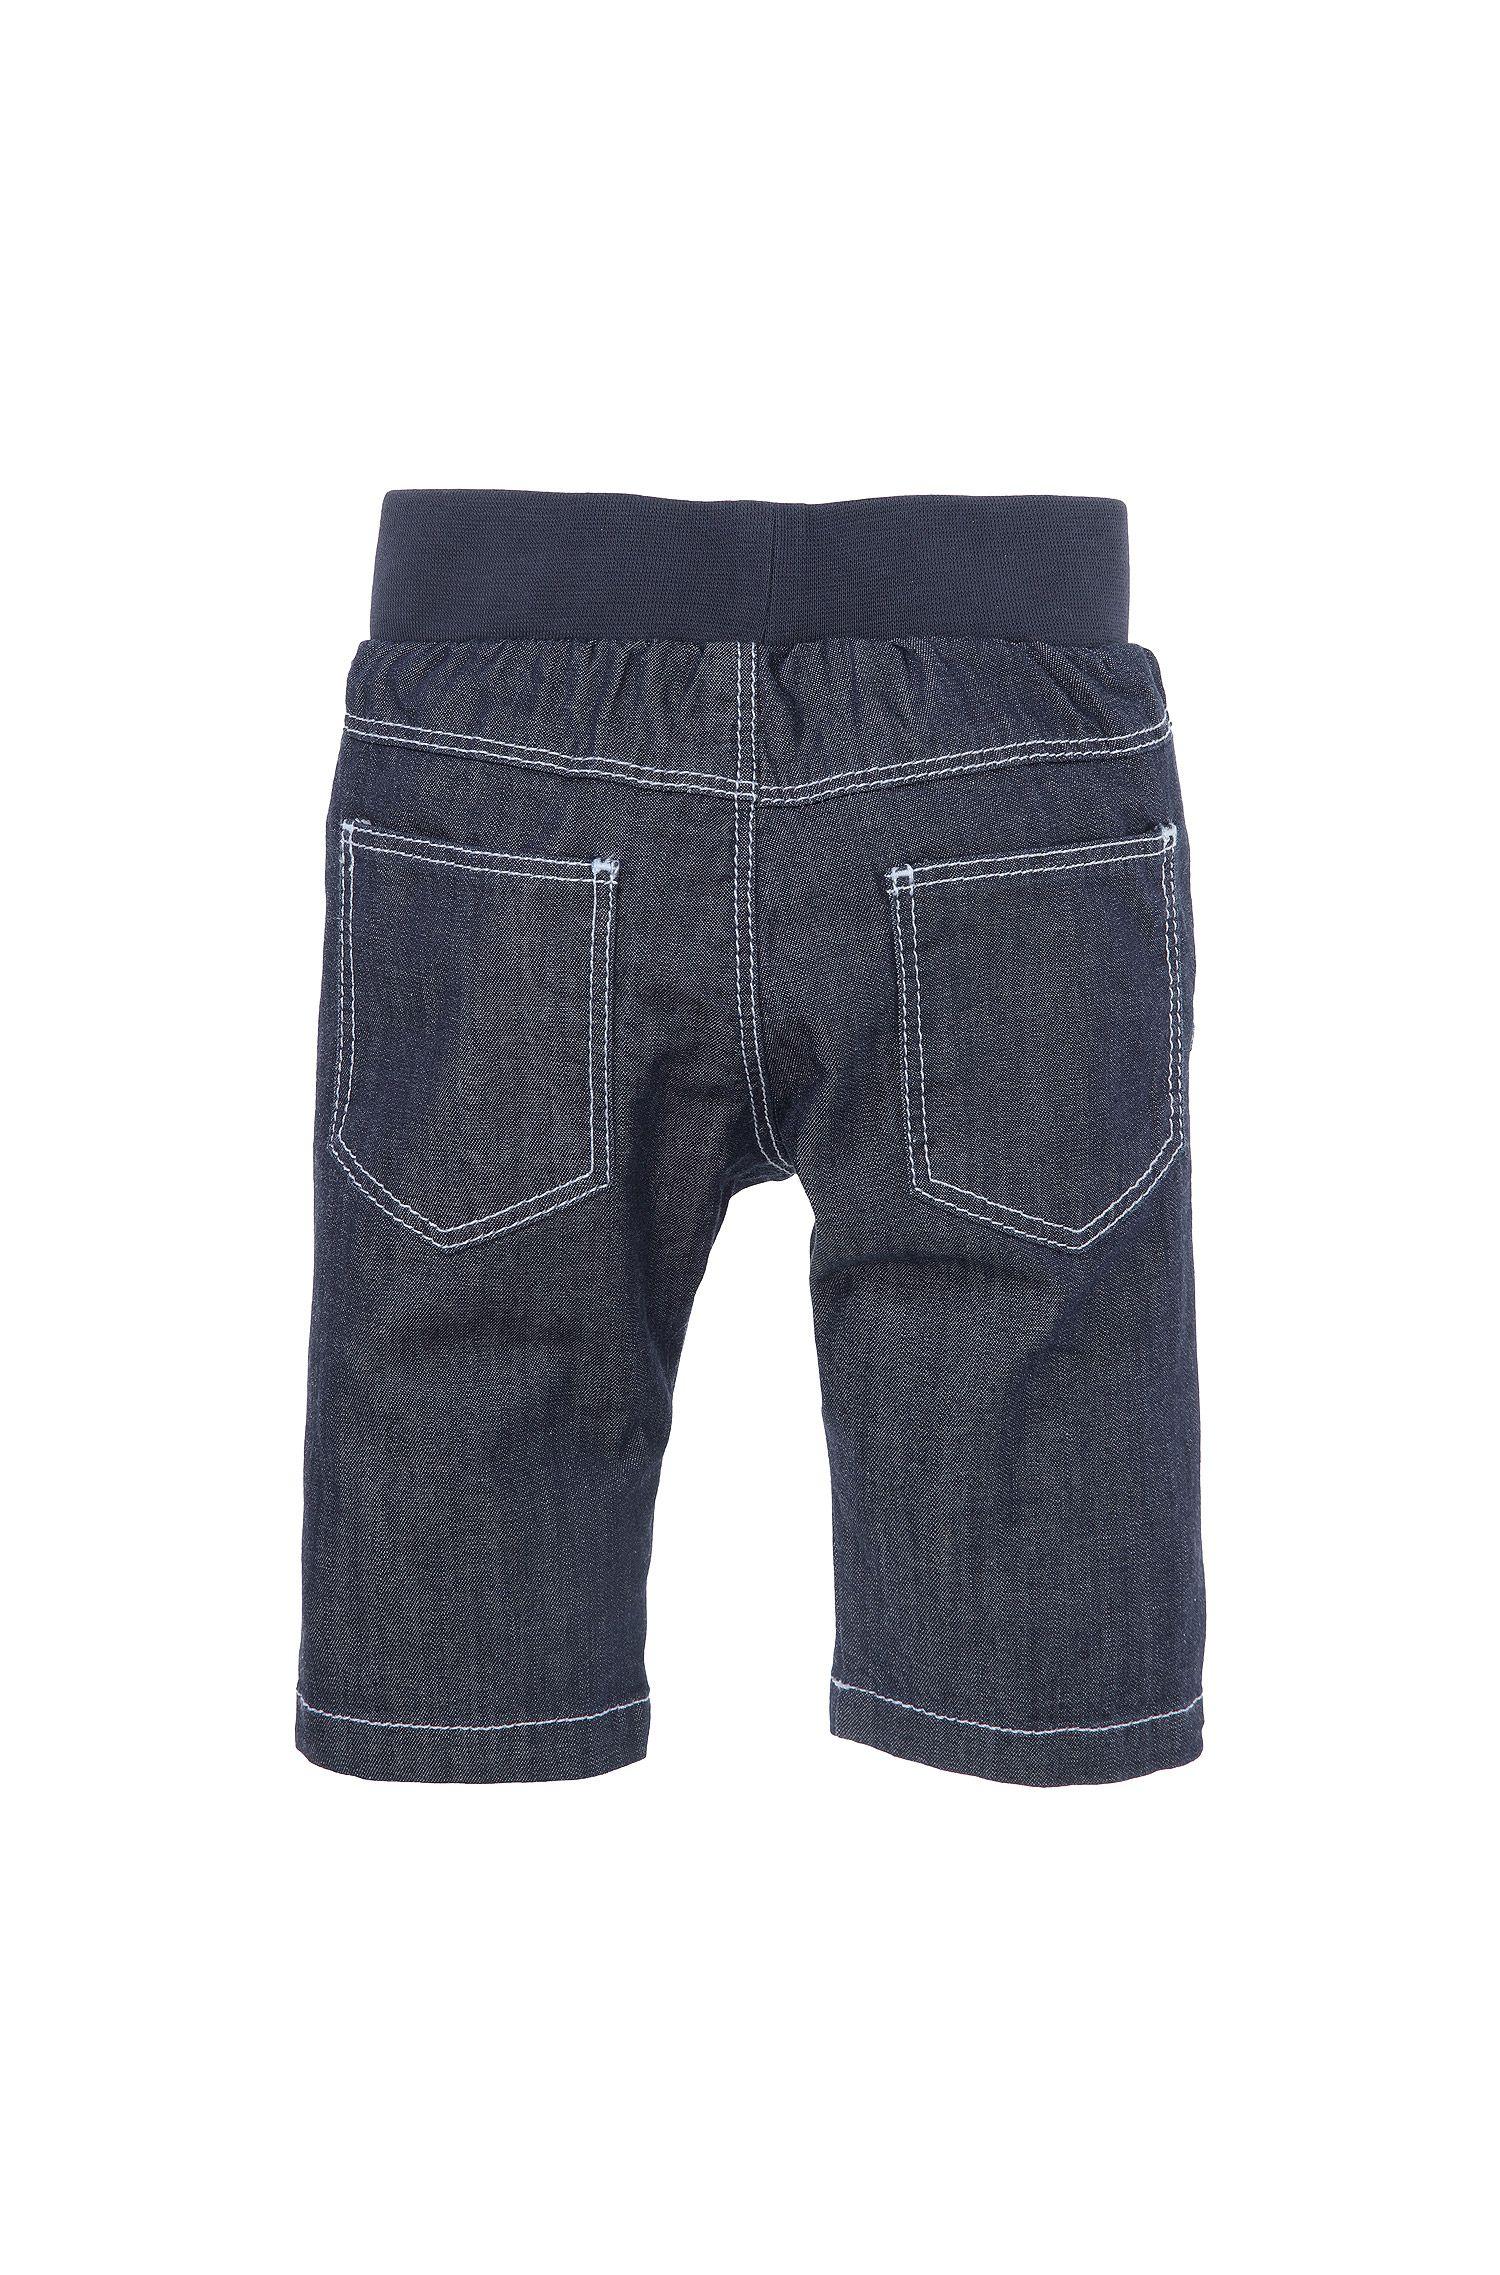 Kids-Jeans ´J94113` aus Baumwoll-Mix